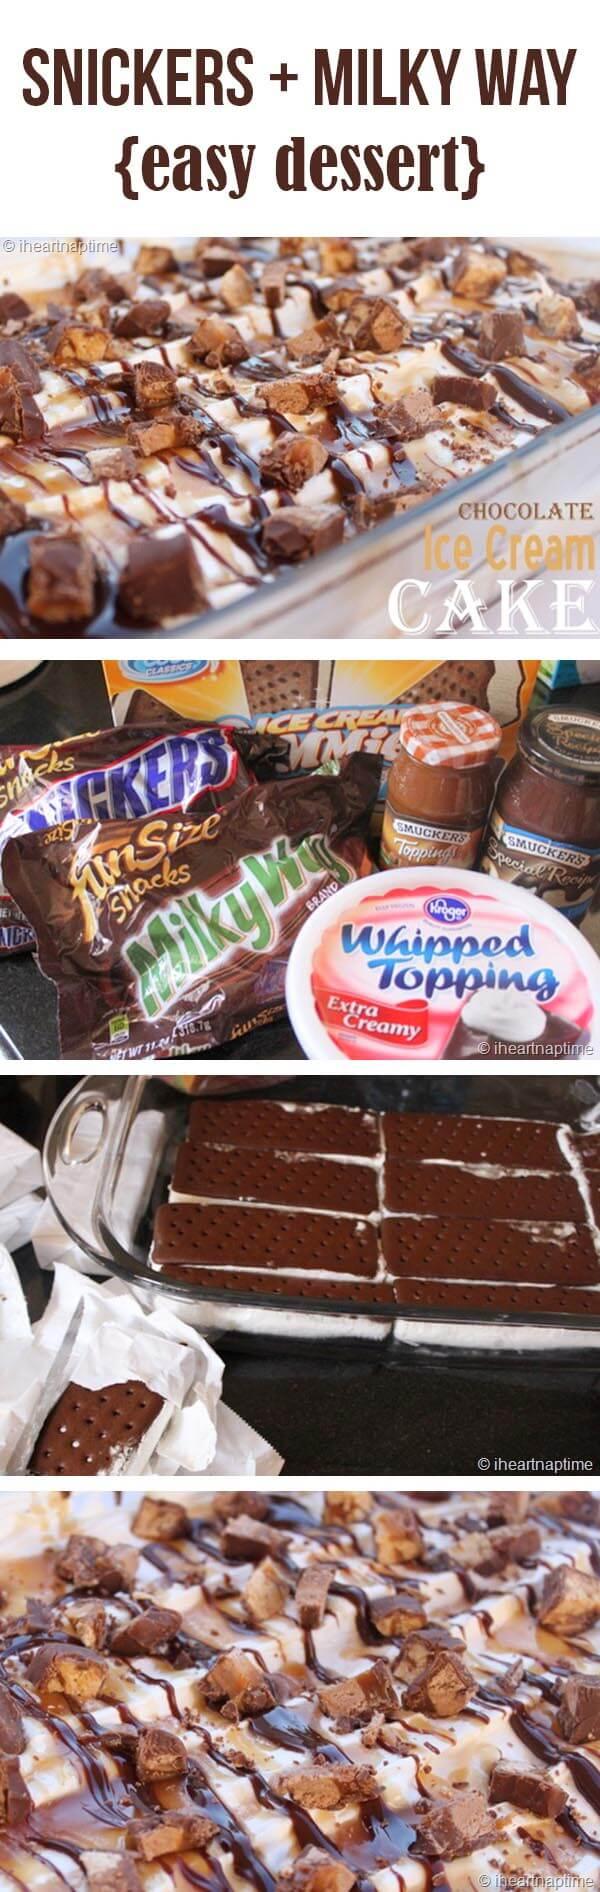 Easy and delicious ice cream cake dessert